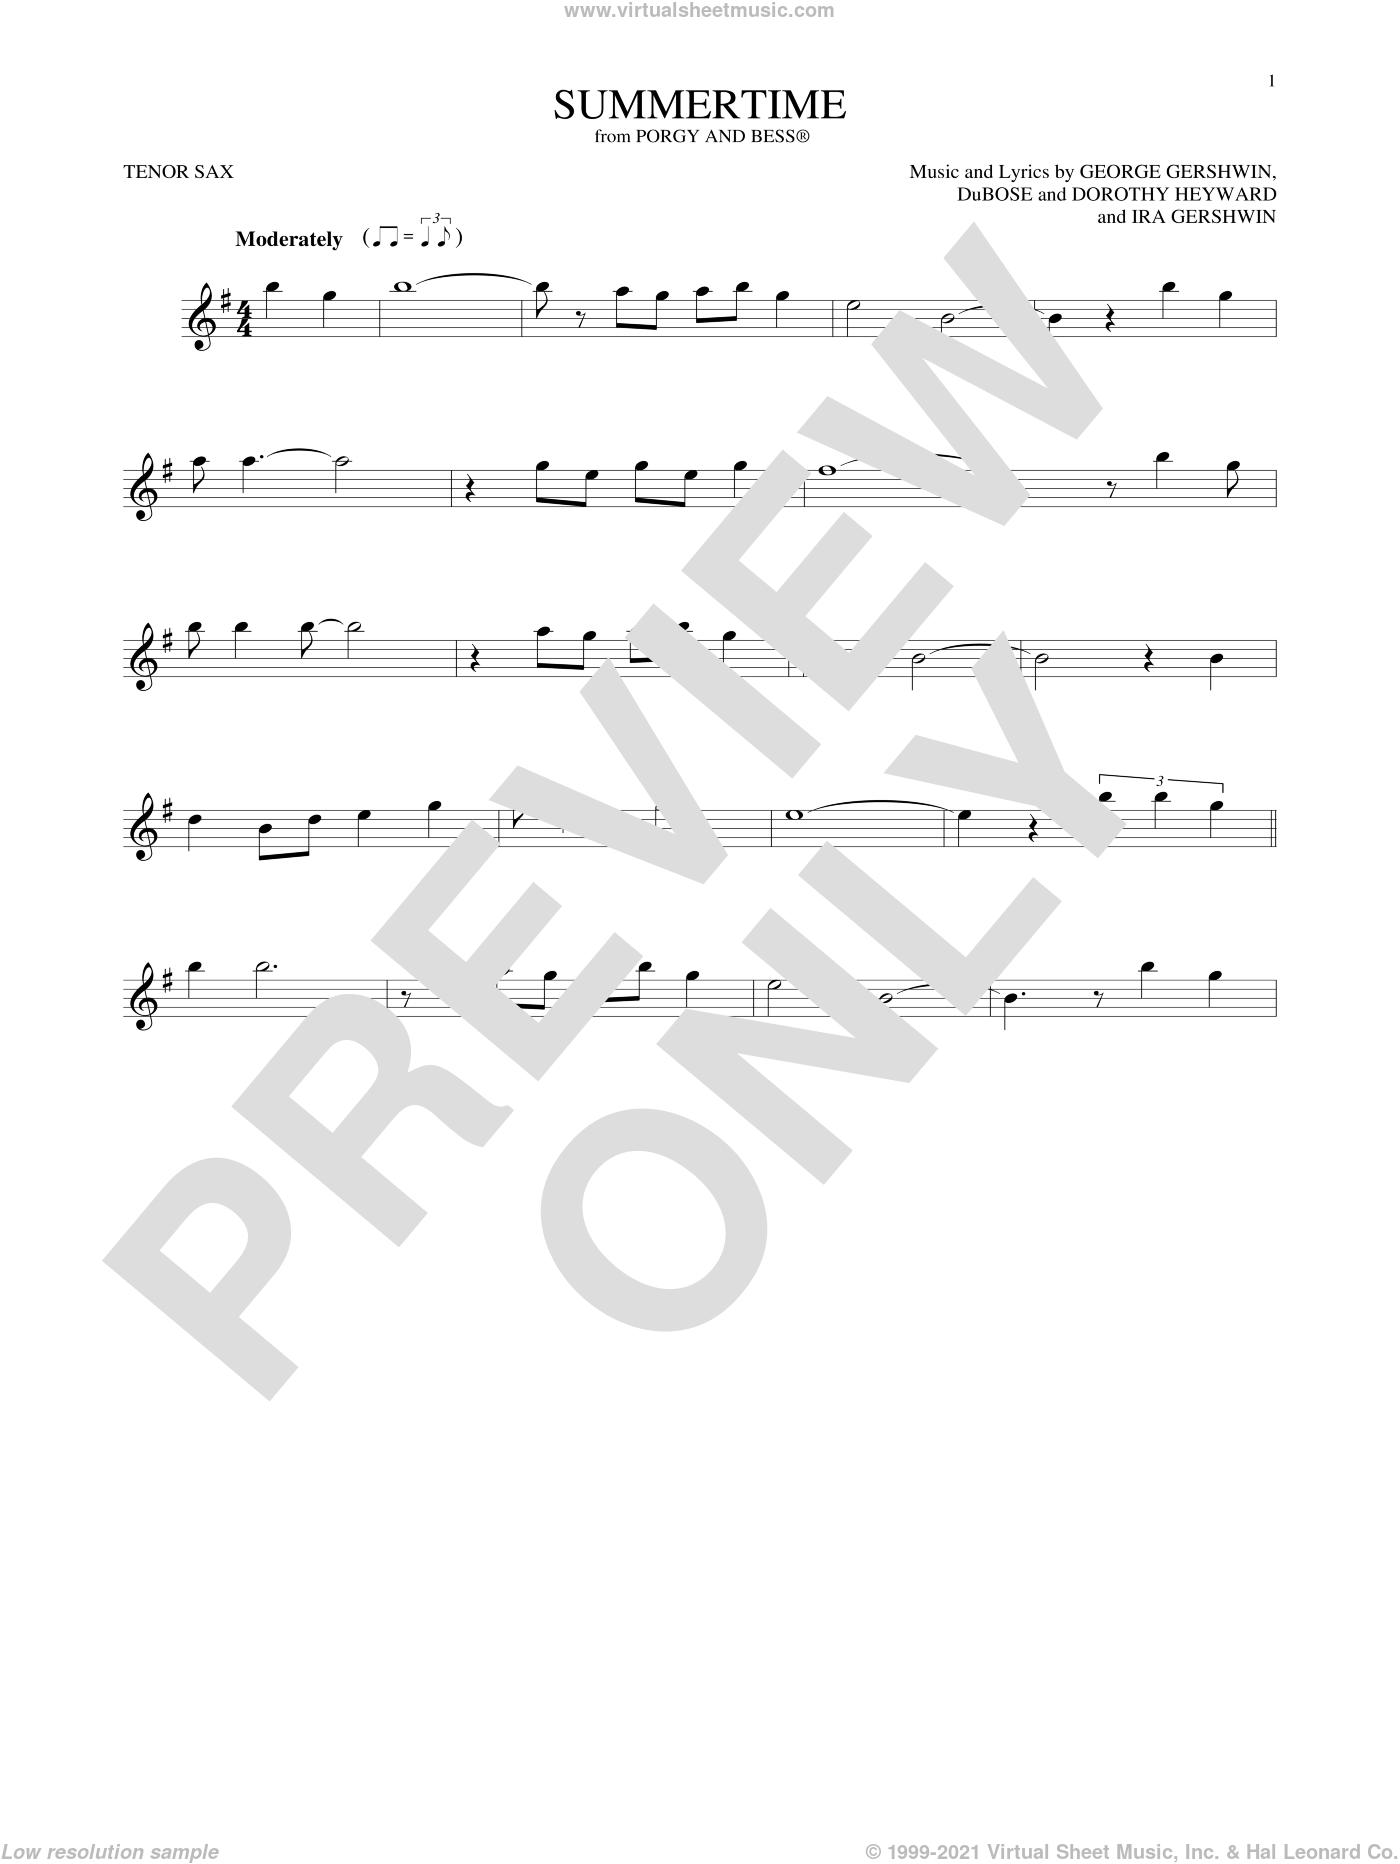 Summertime sheet music for tenor saxophone solo by George Gershwin, Dorothy Heyward, DuBose Heyward and Ira Gershwin, intermediate skill level